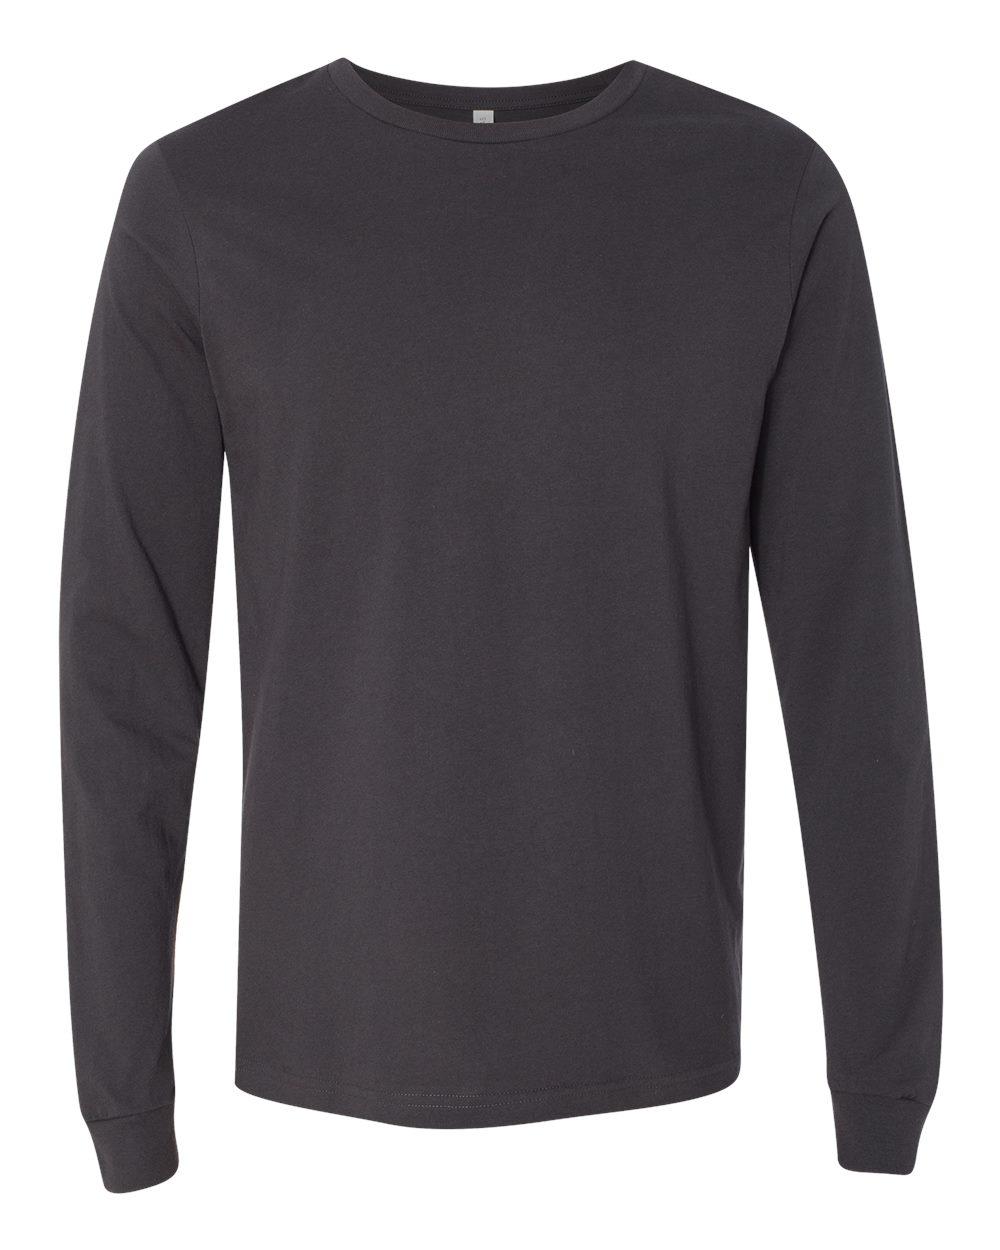 Bella-Canvas-Mens-Blank-Top-Long-Sleeve-Jersey-Tee-T-Shirt-3501-up-to-3XL thumbnail 36